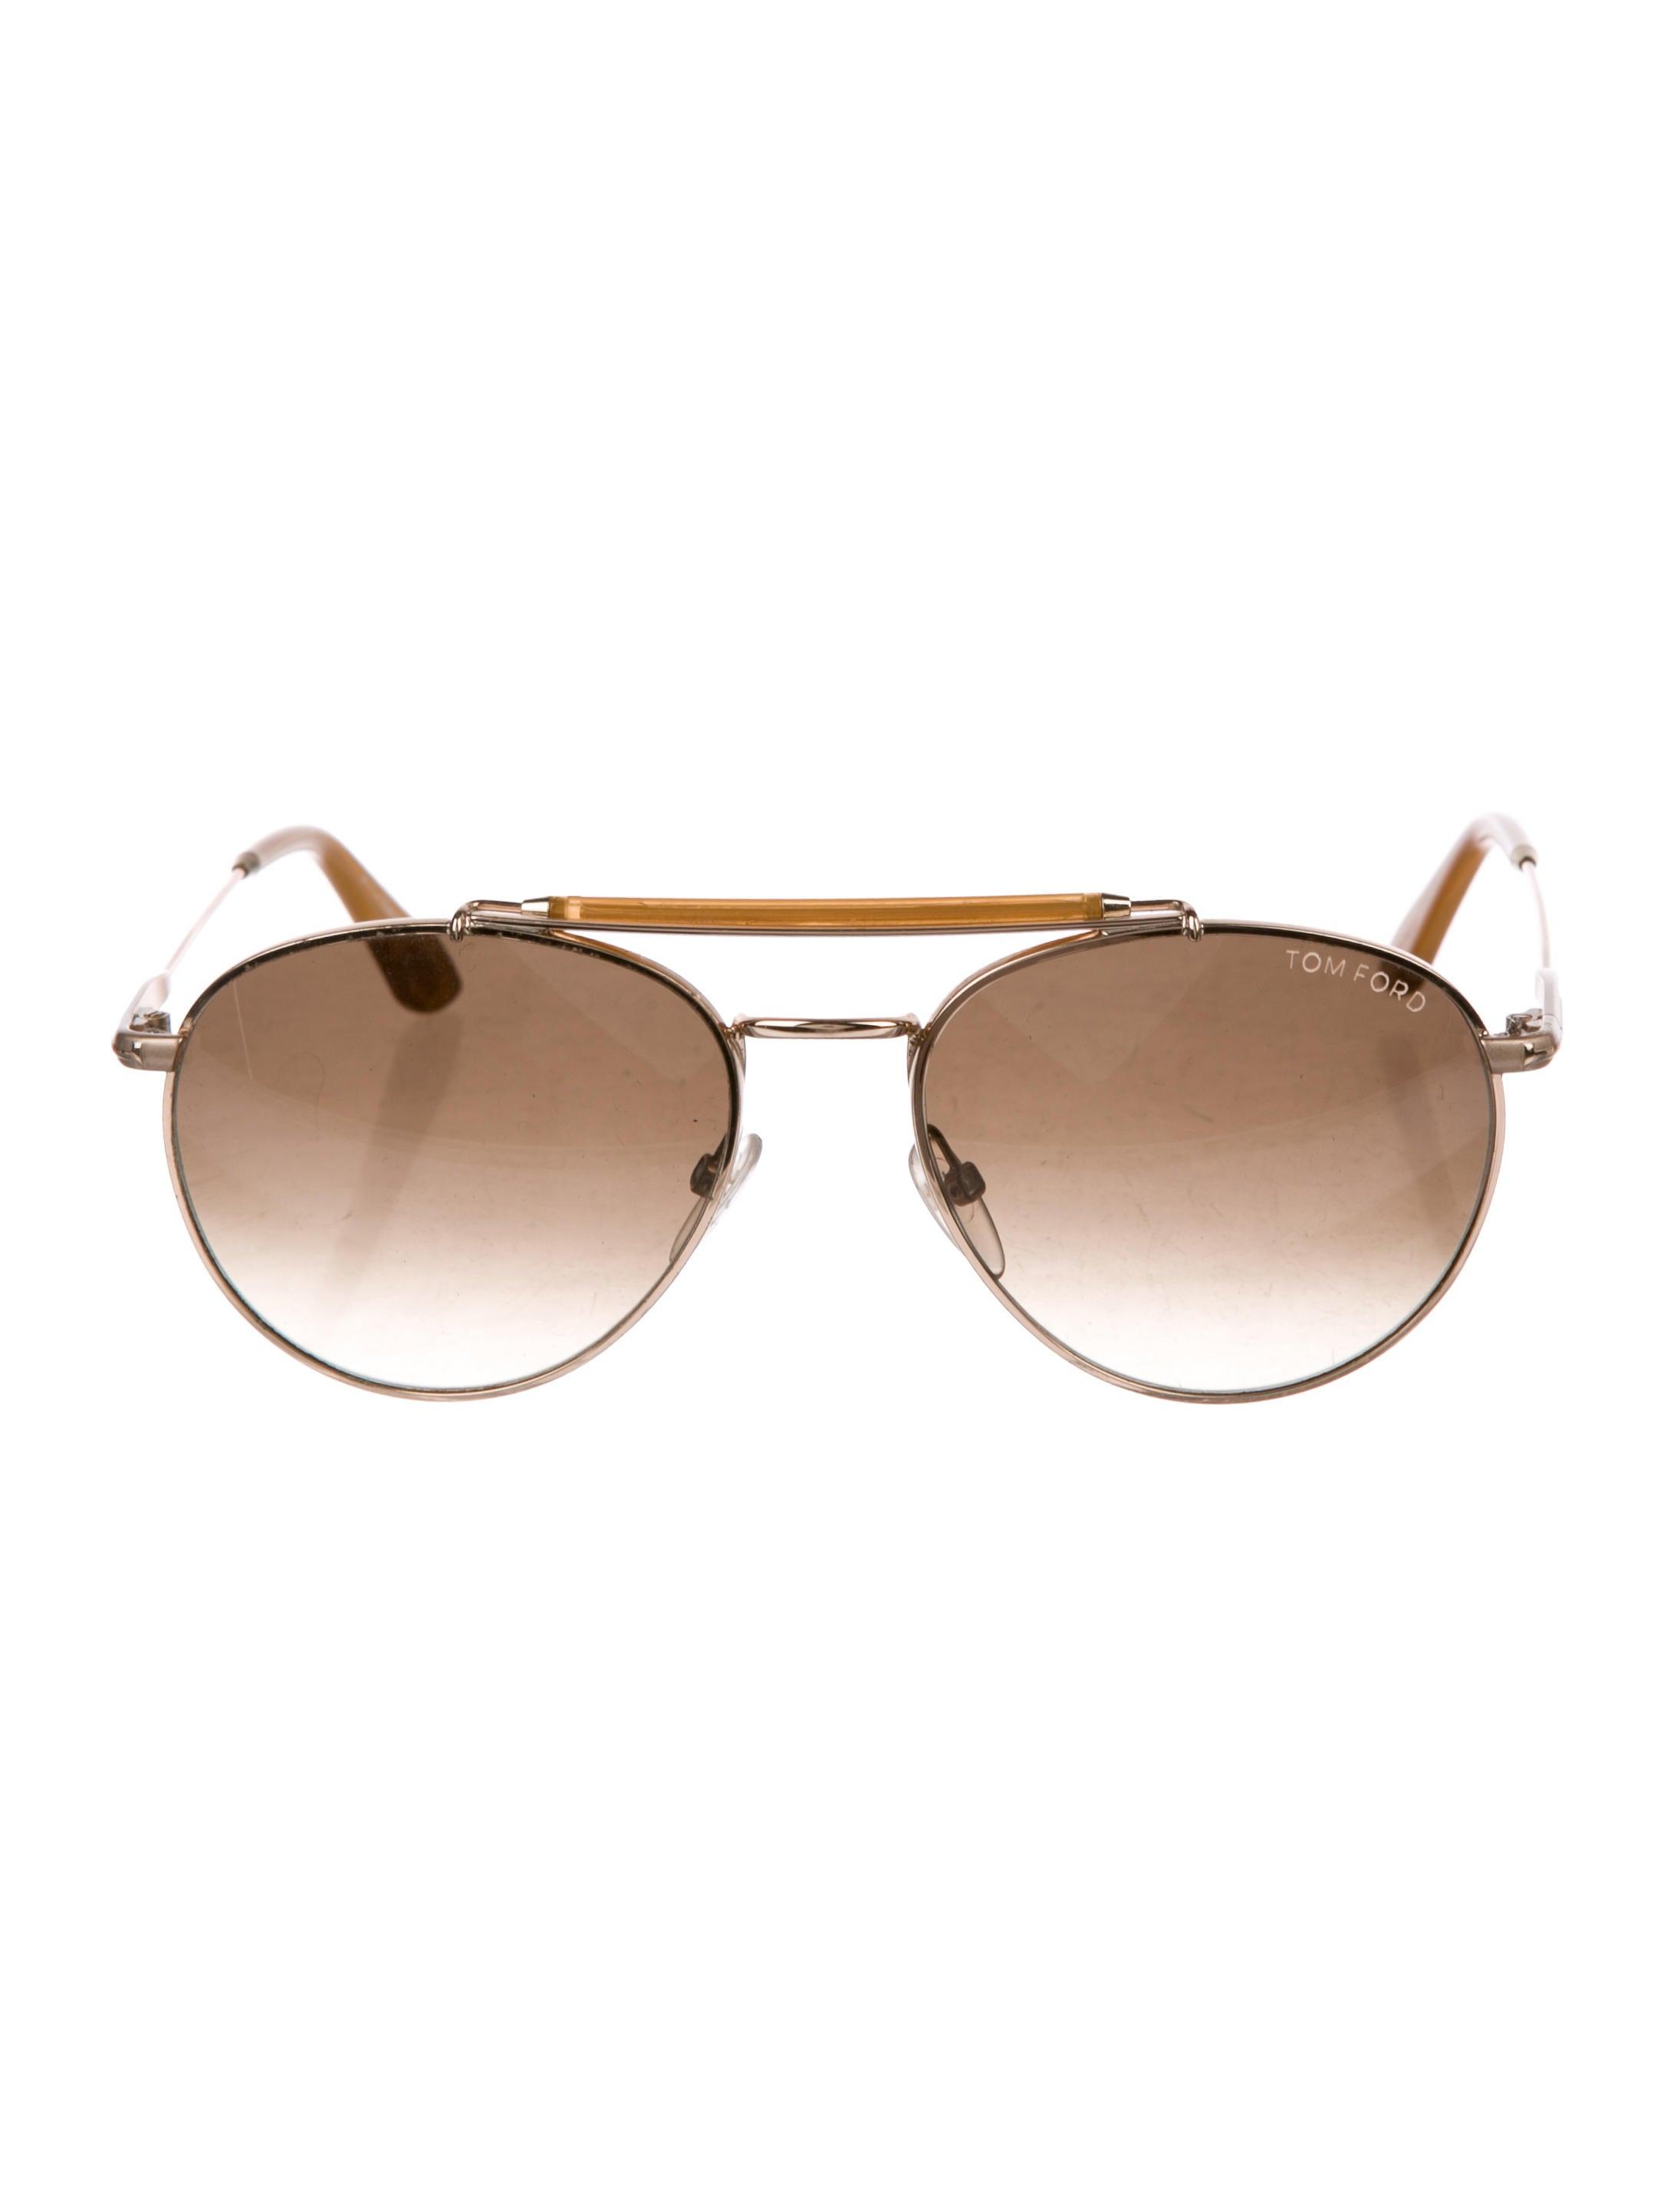 f5fe1665b7bd9 Tom Ford Colin Aviator Sunglasses - Accessories - TOM43544